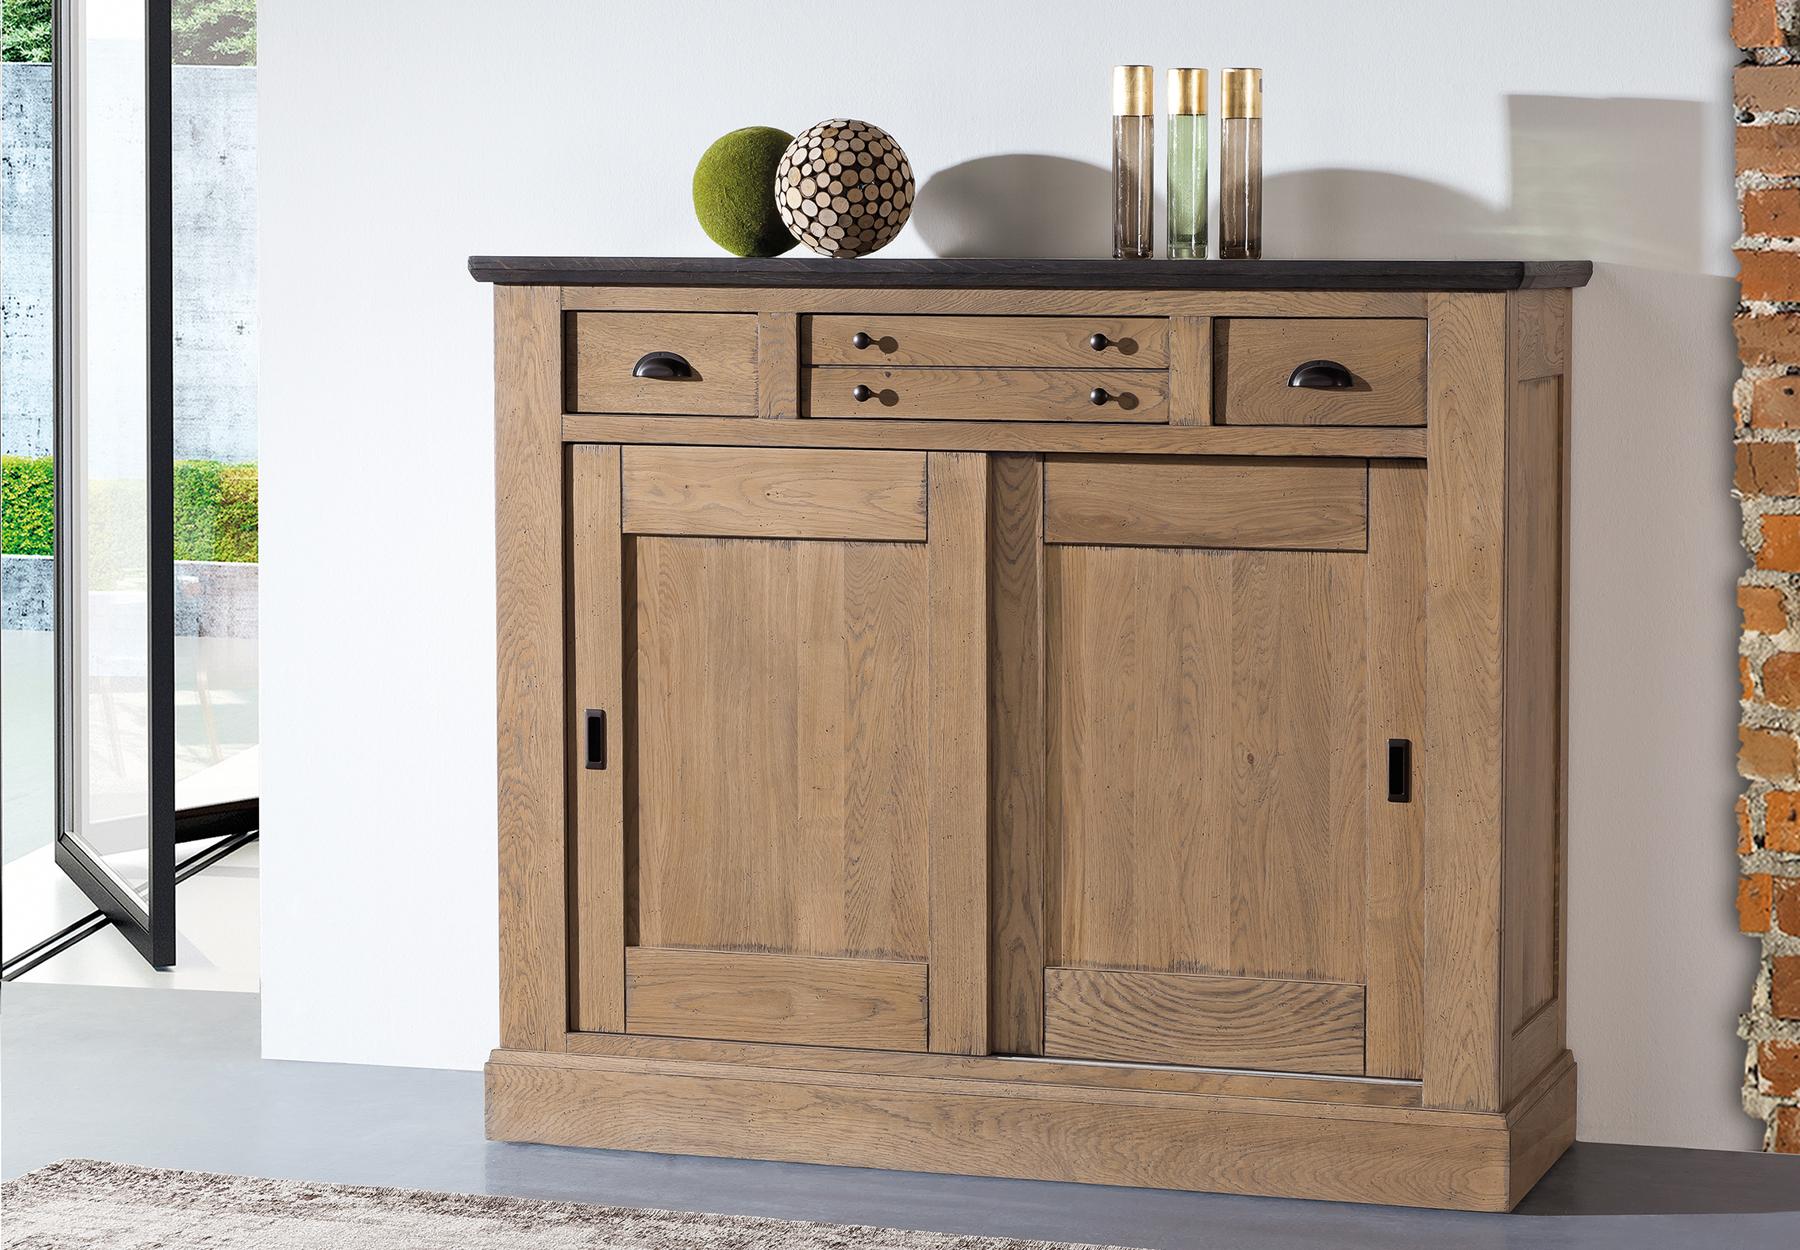 bahut haut romance meubles fouillard. Black Bedroom Furniture Sets. Home Design Ideas